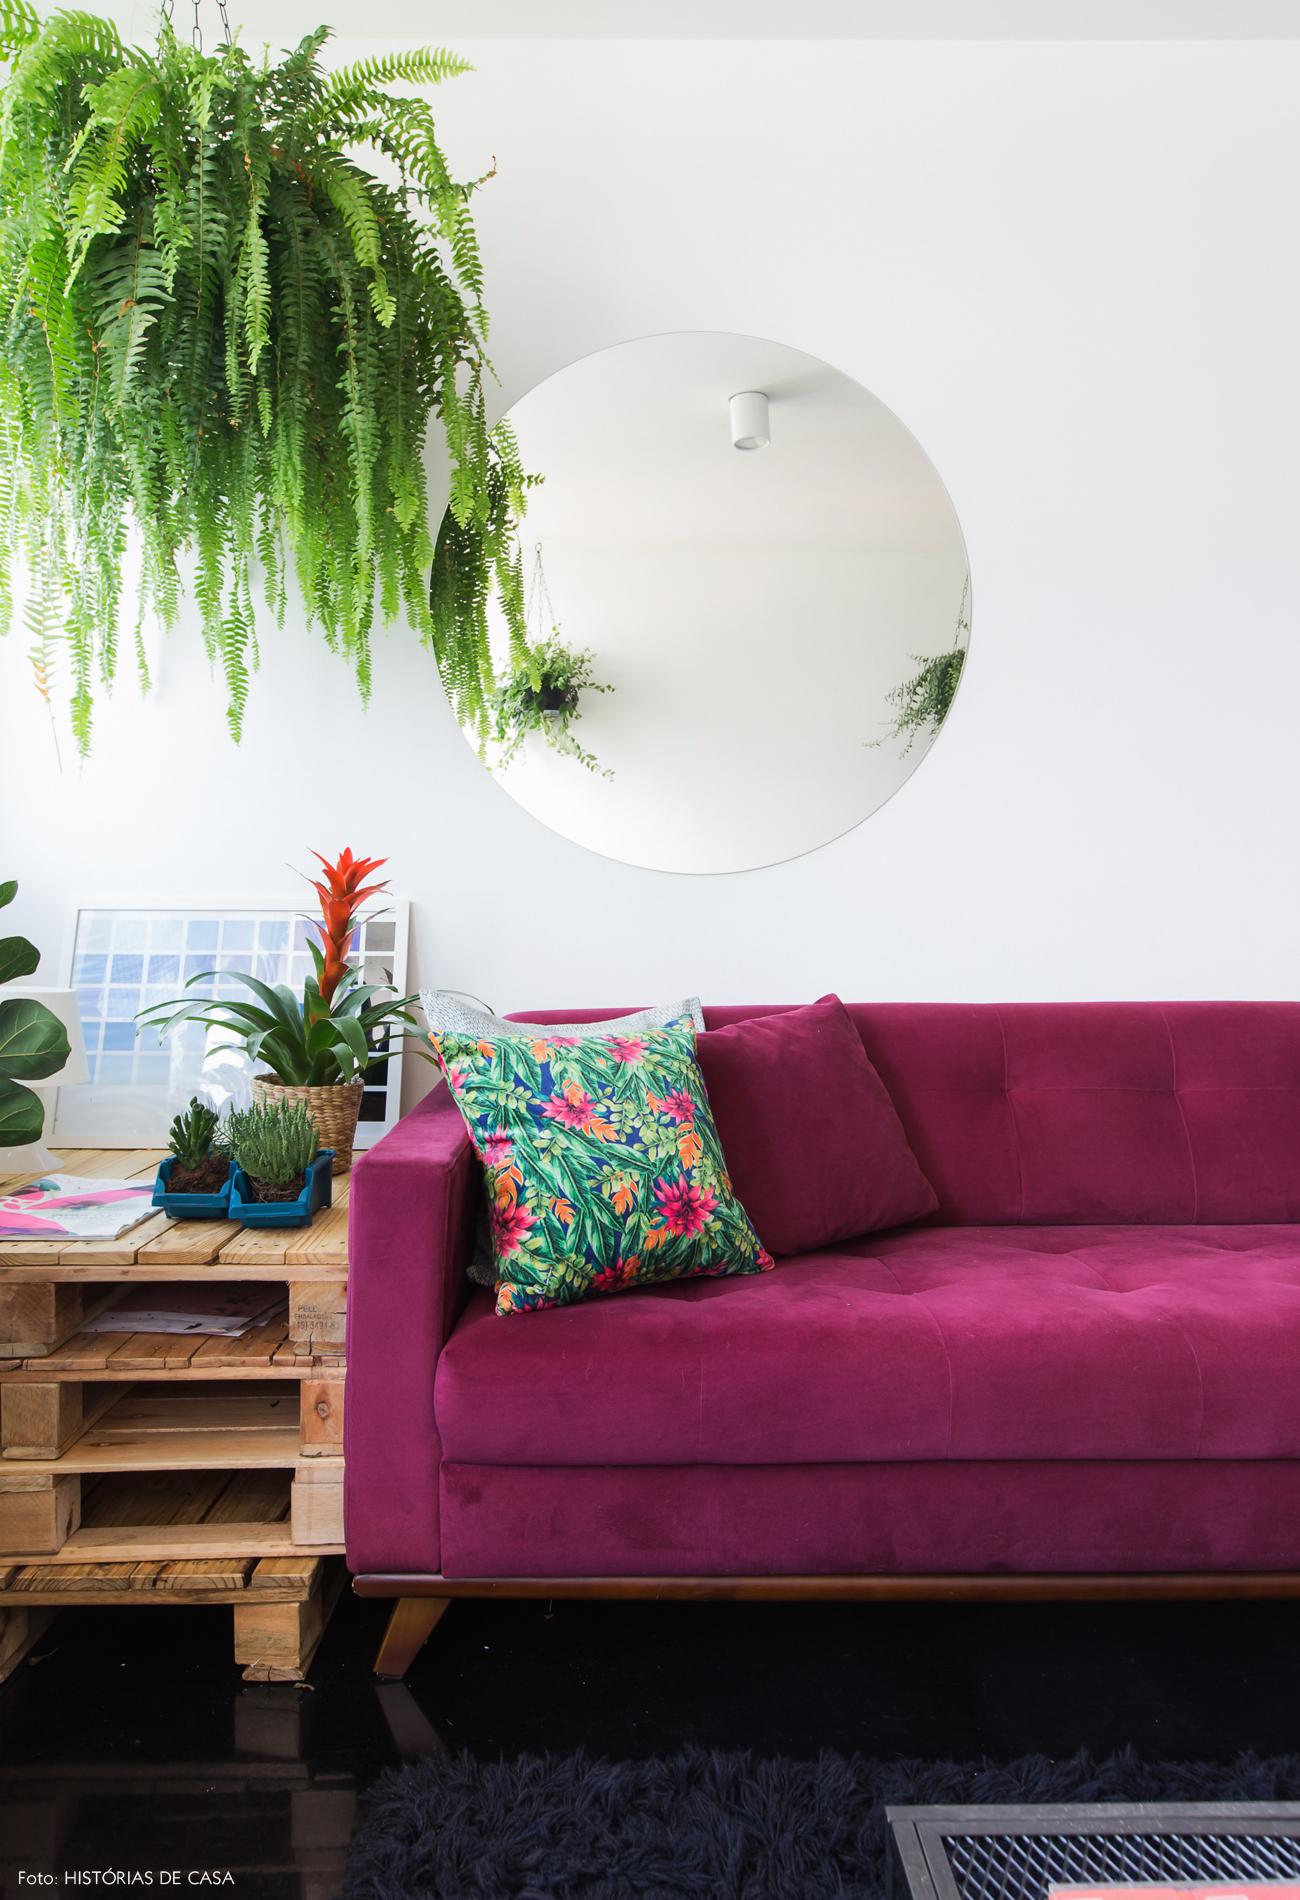 47-decoracao-boas-ideias-cores-sofa-roxo-pallets-plantas.jpg